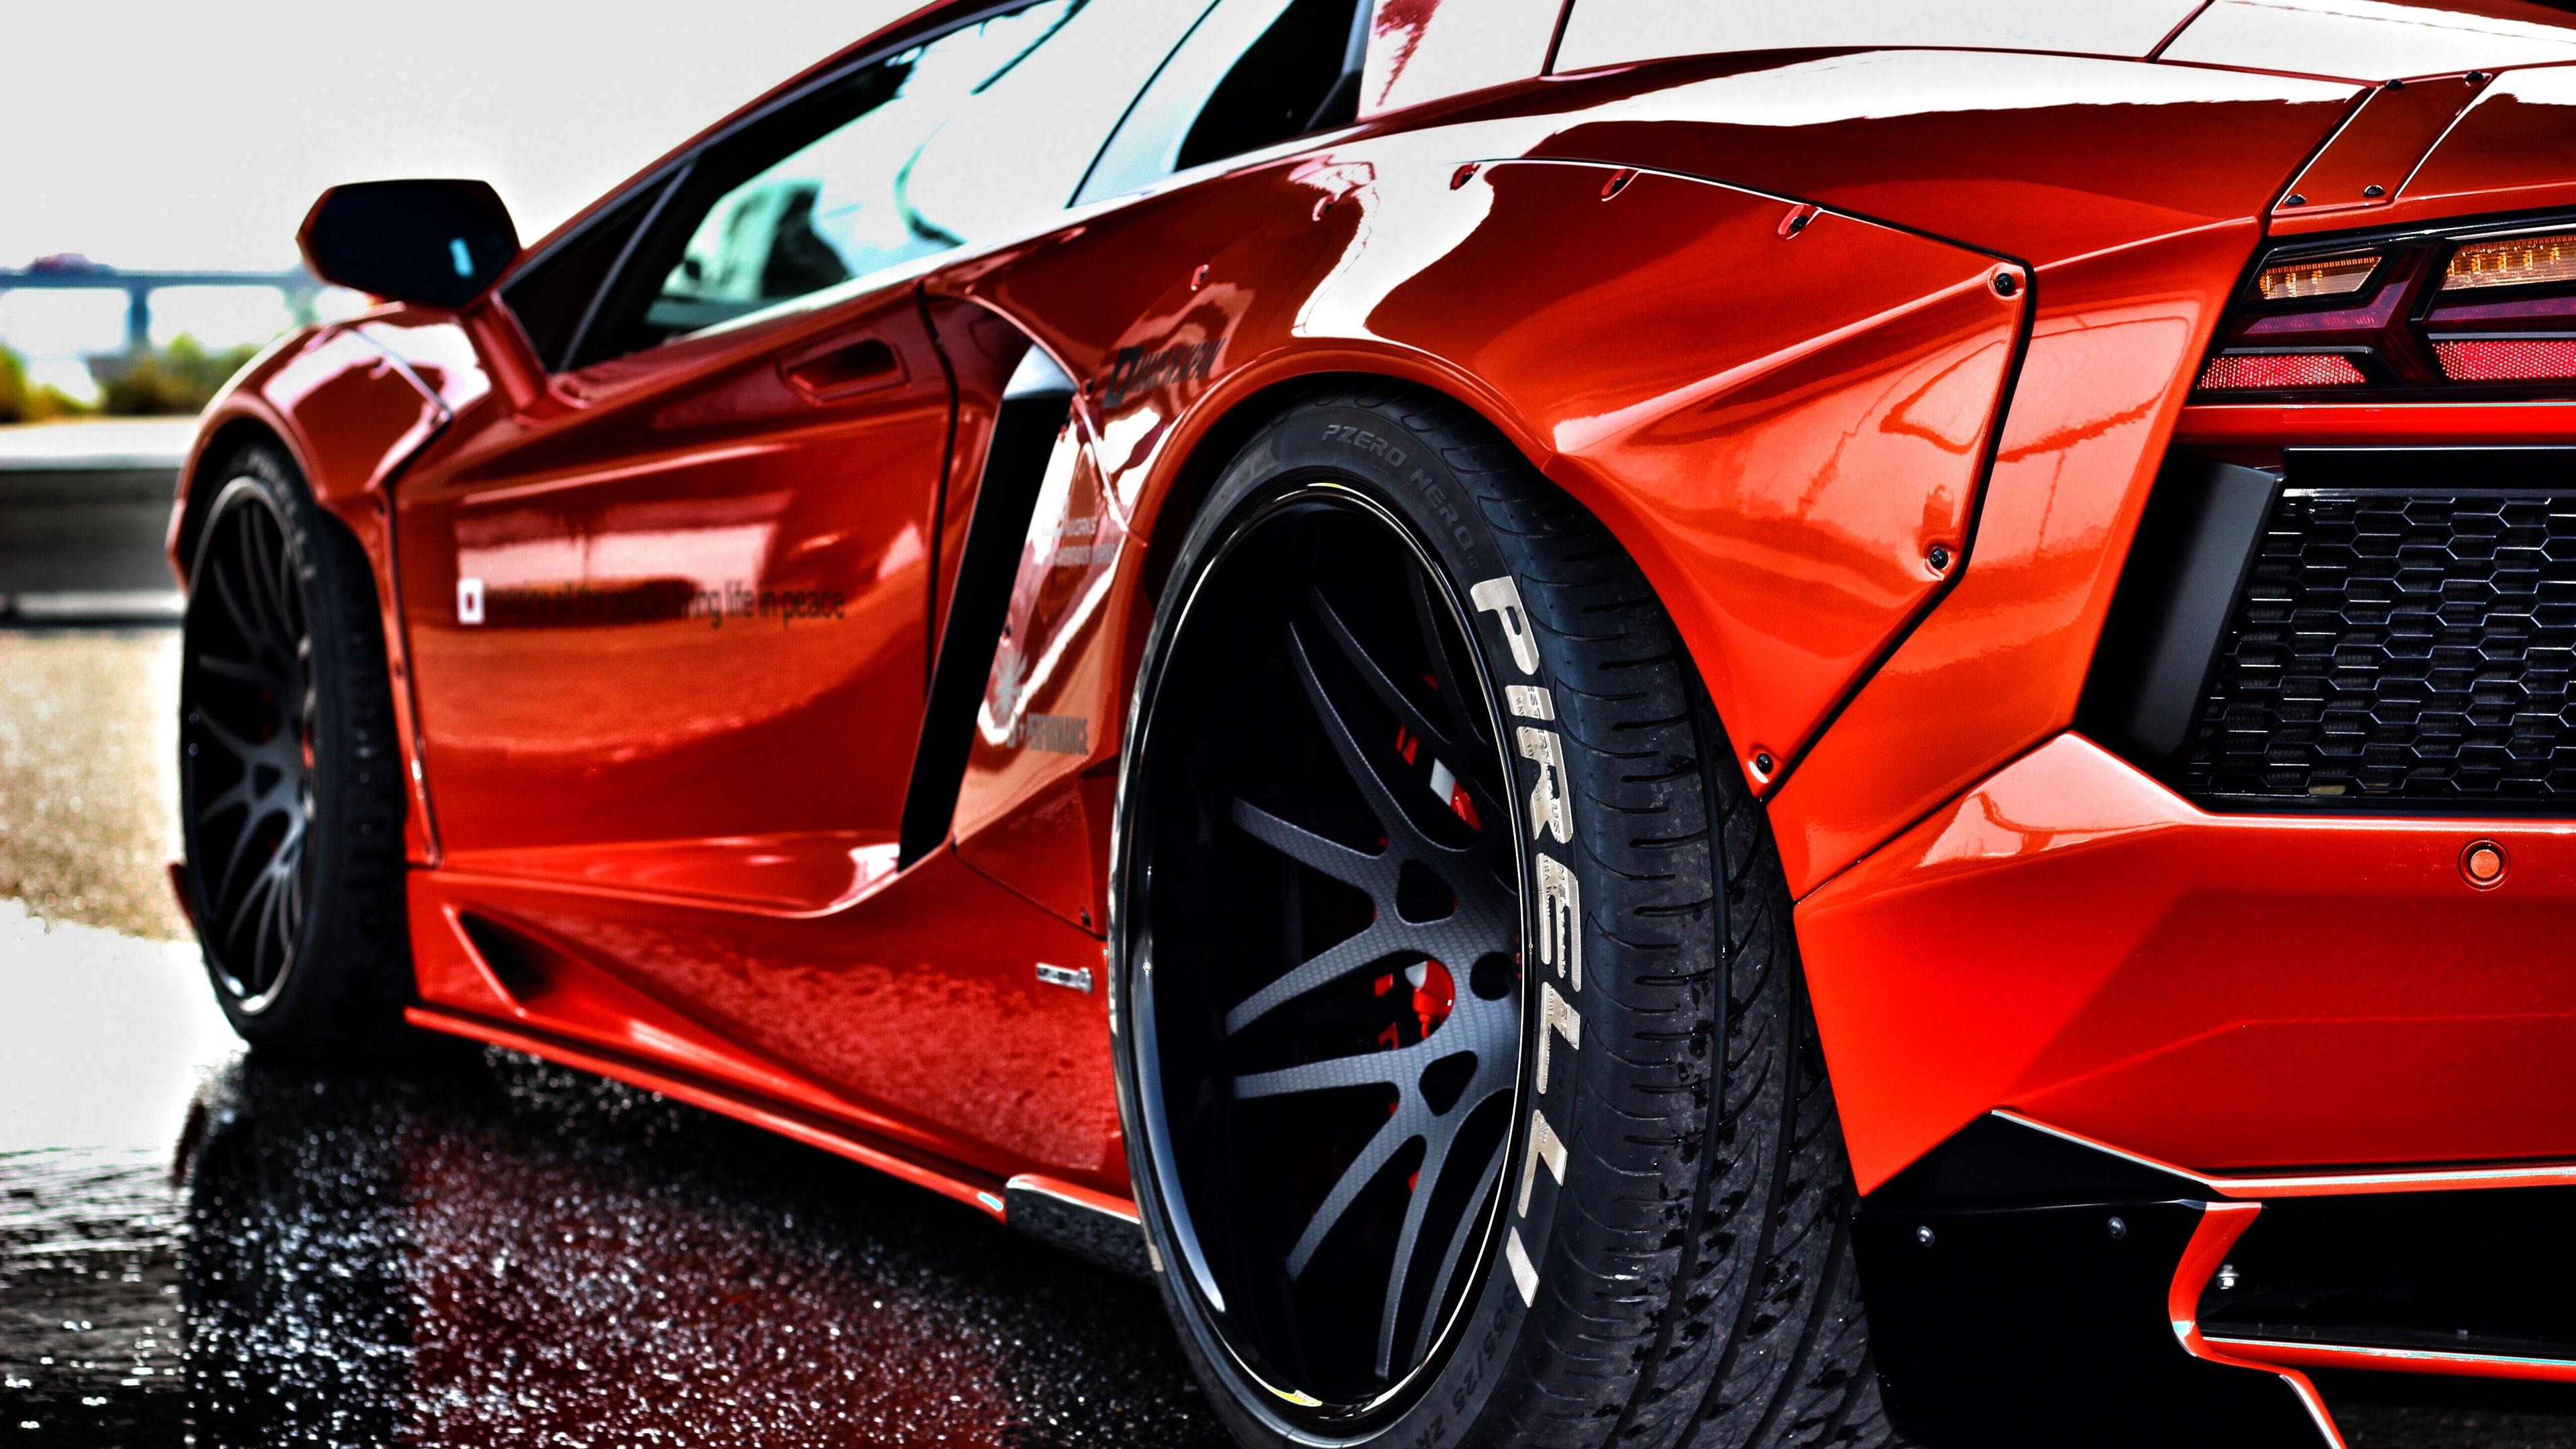 Red Lamborghini Aventador Rear Lamborghini Wallpapers Lamborghini Aventador Wallpapers Red Lamborghini Lamborghini Aventador Wallpaper Lamborghini Aventador